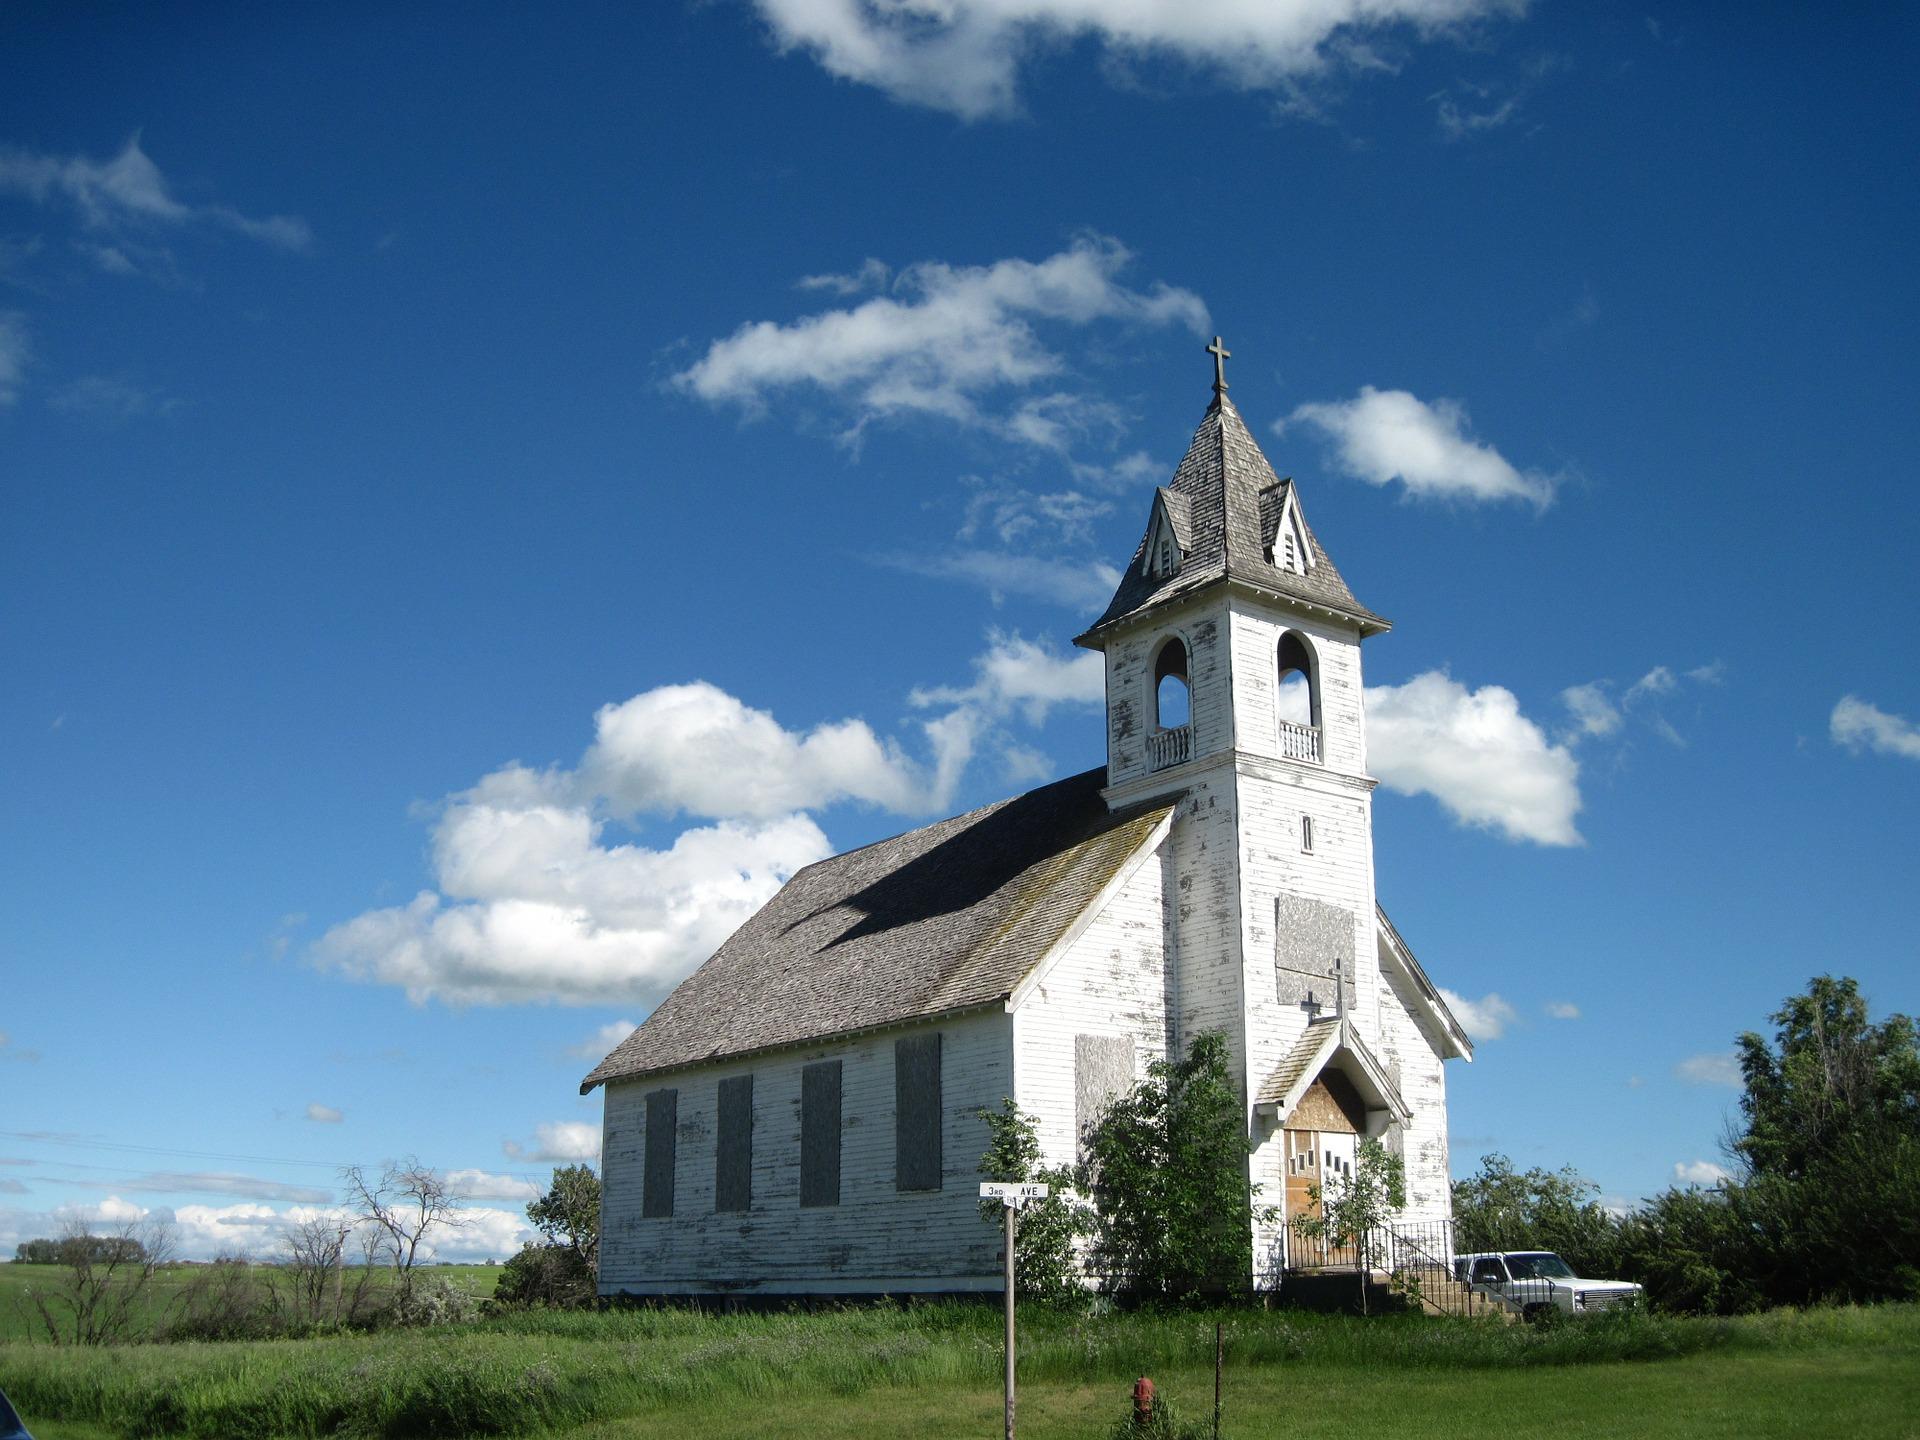 abandoned-church-337768_1920.jpg